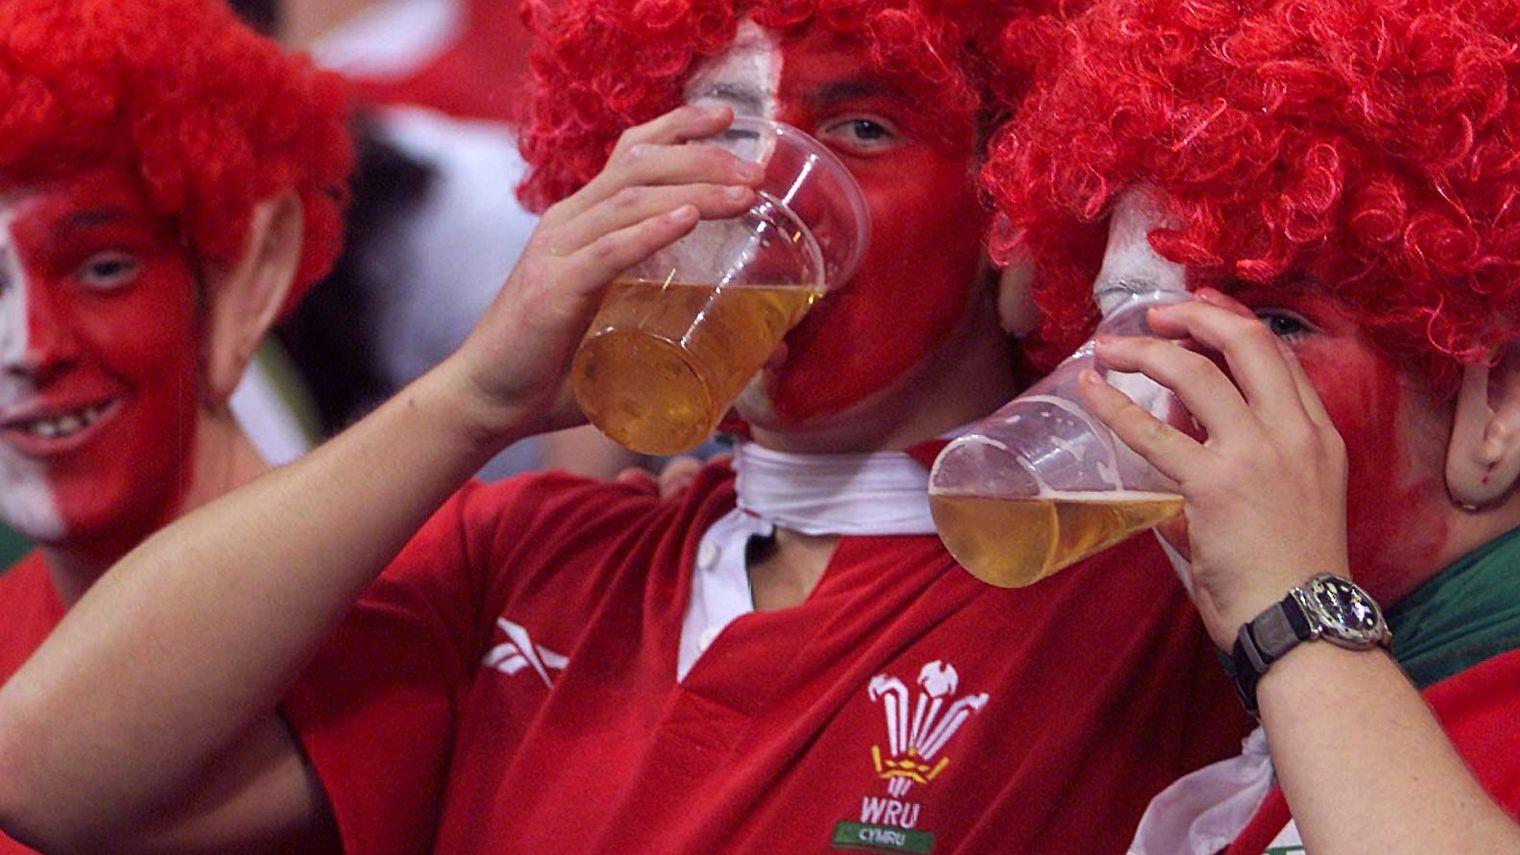 Mondial 2022: l'alcool sera interdit dans les espaces publics